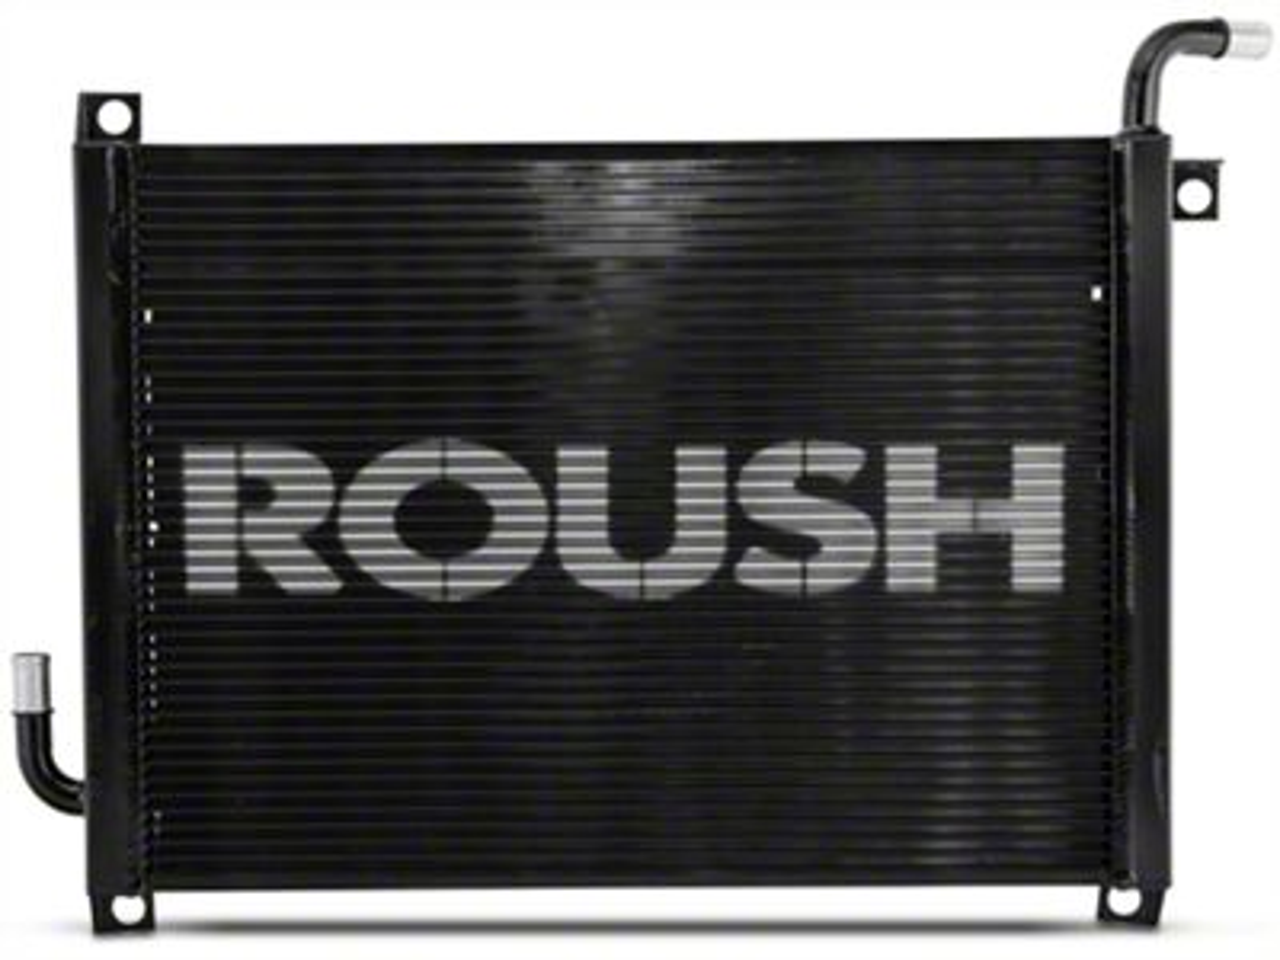 Roush Upper Mount Low Temp Supercharger Radiator Upgrade (11-14 5.0L, 6.2L F-150)